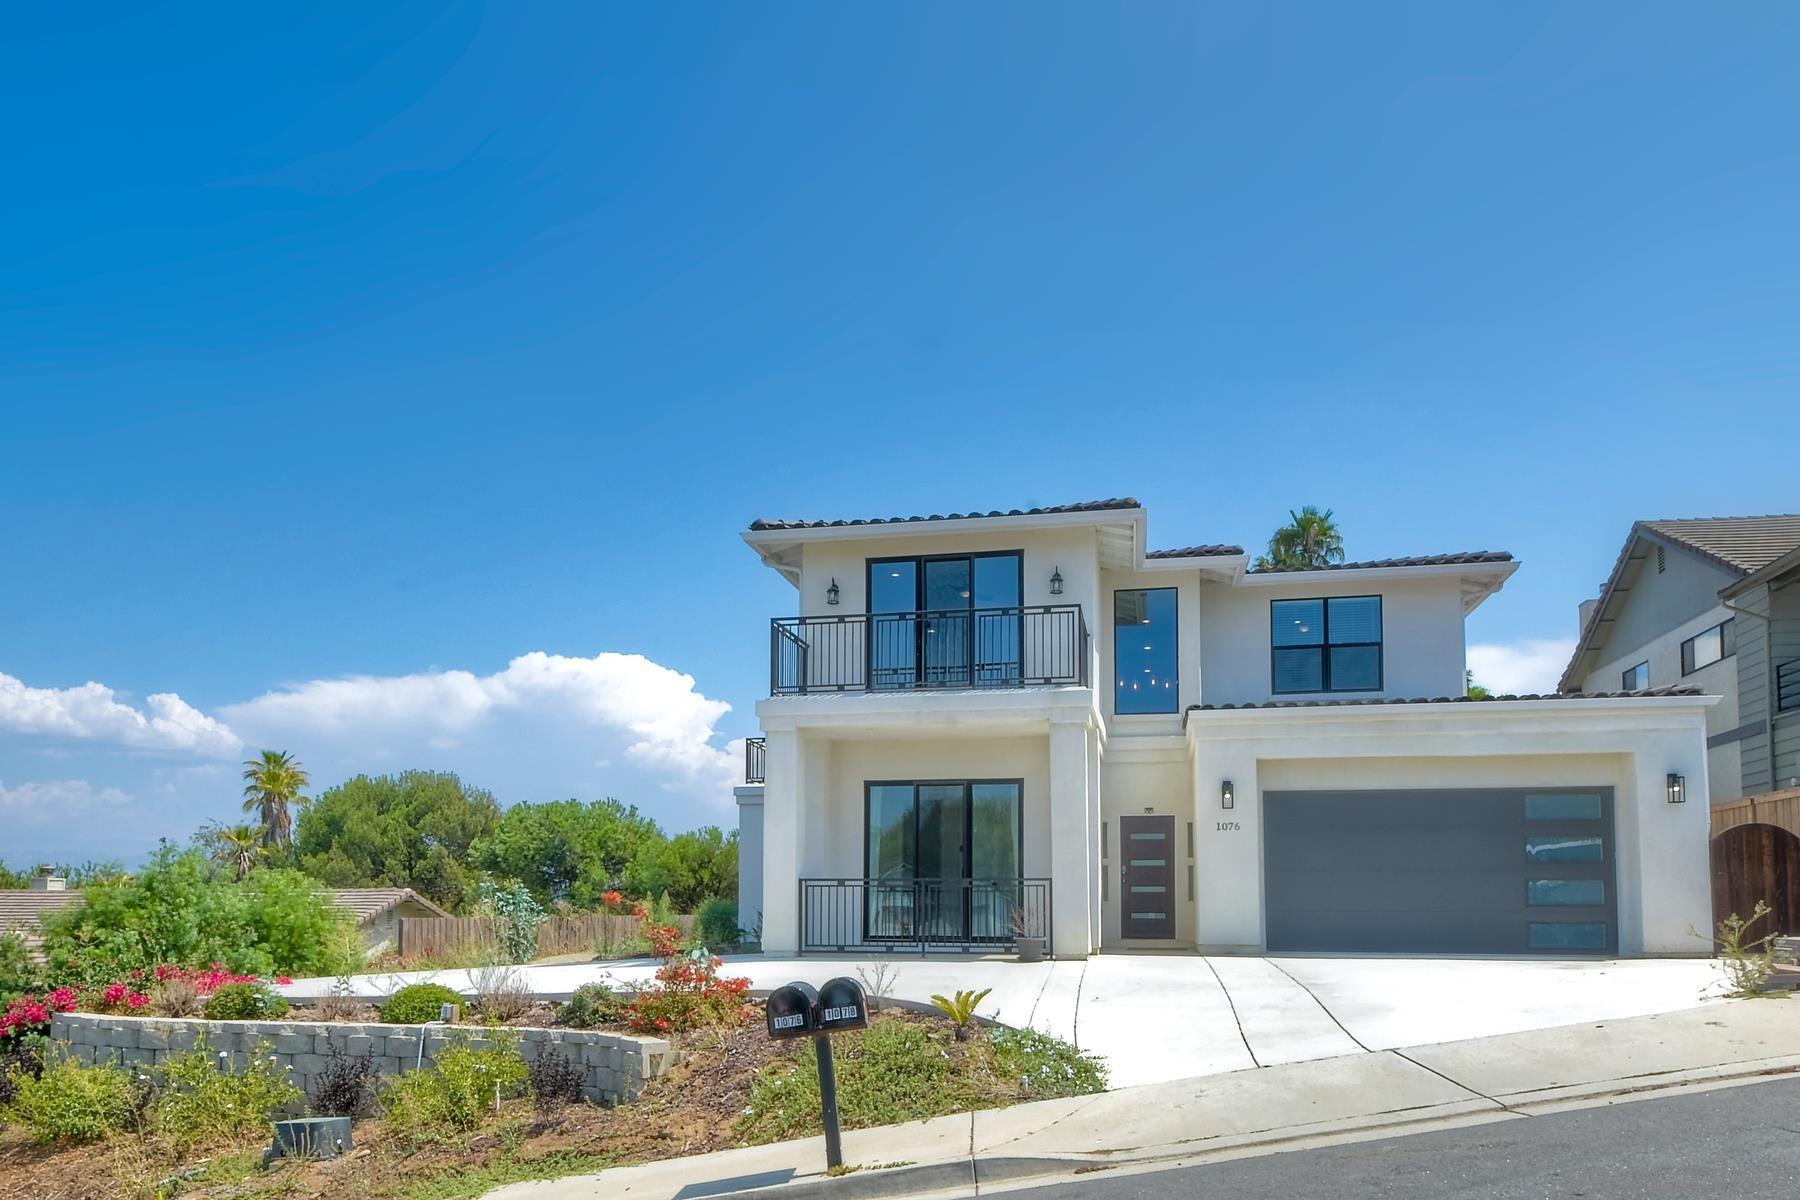 Photo of 1076 Circle Drive, Escondido, CA 92025